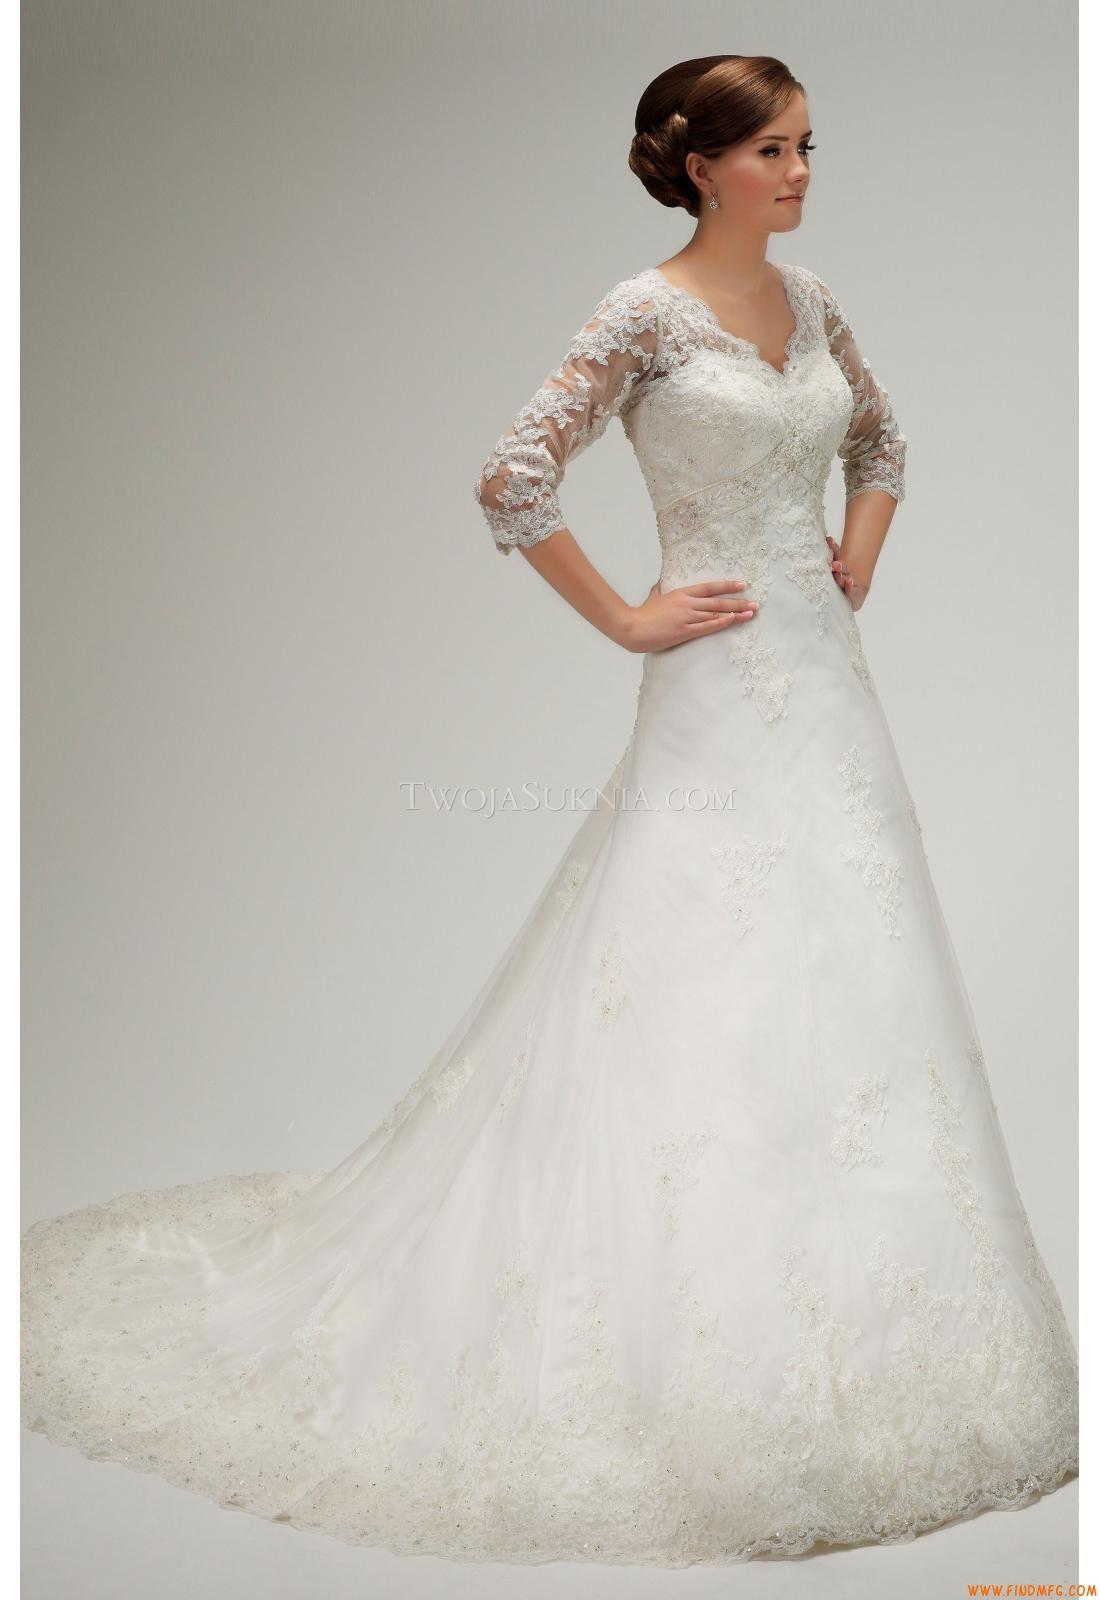 Vestidos de noiva Lisa Donetti 70254 2013